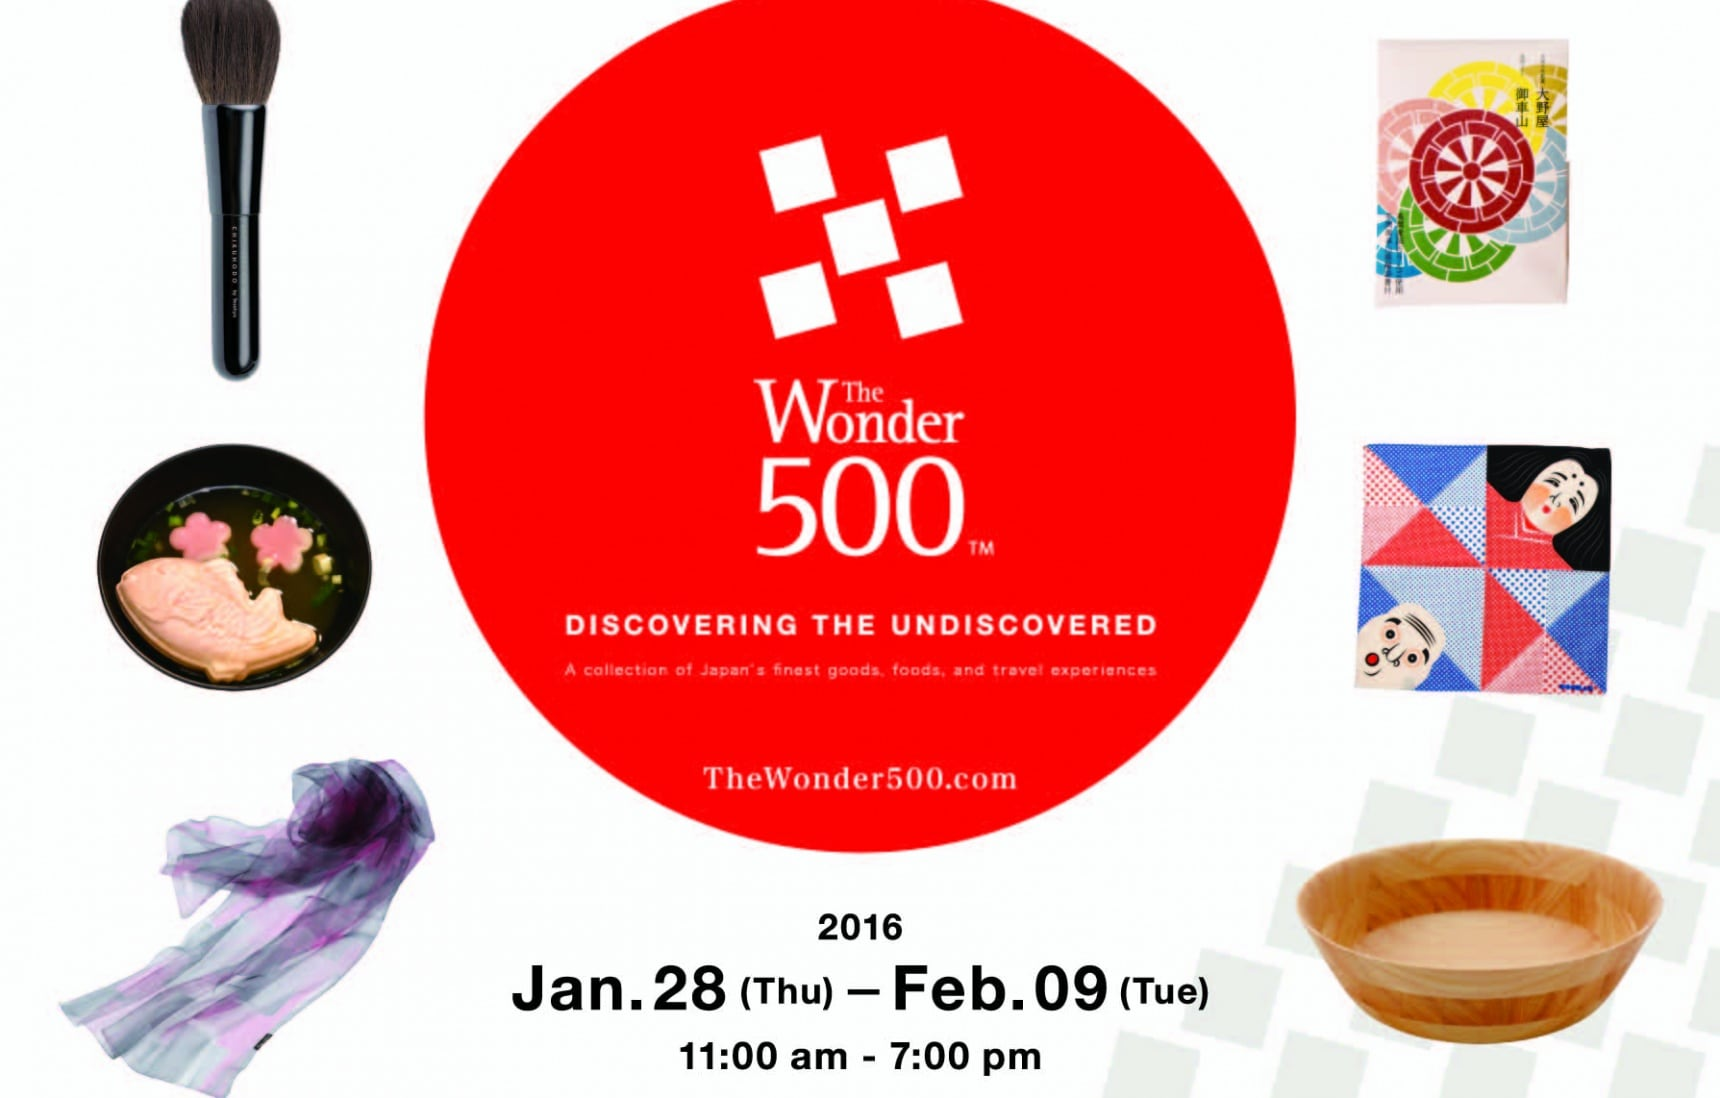 The Wonder 500™ Exhibition in New York